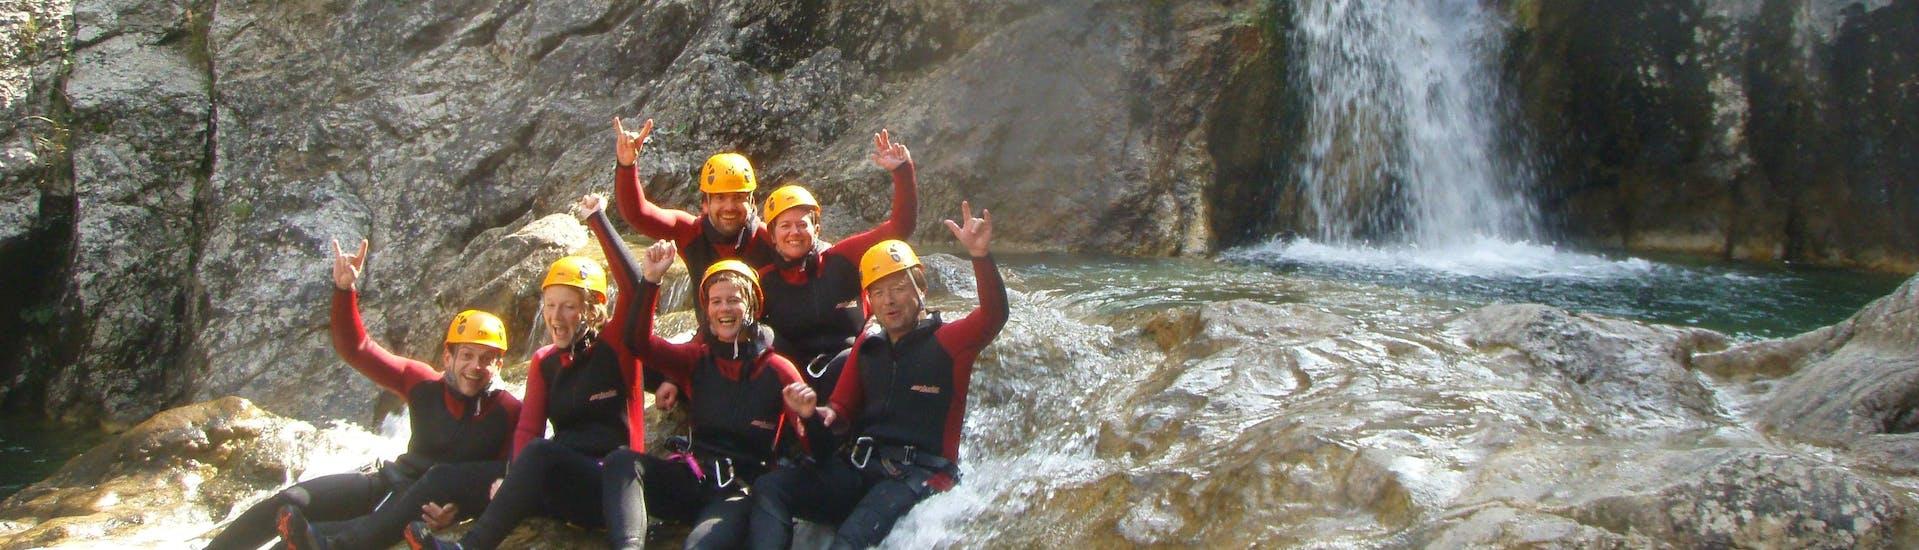 Canyoning facile à Reutte - Stuibenfälle avec White Mountain - Hero image